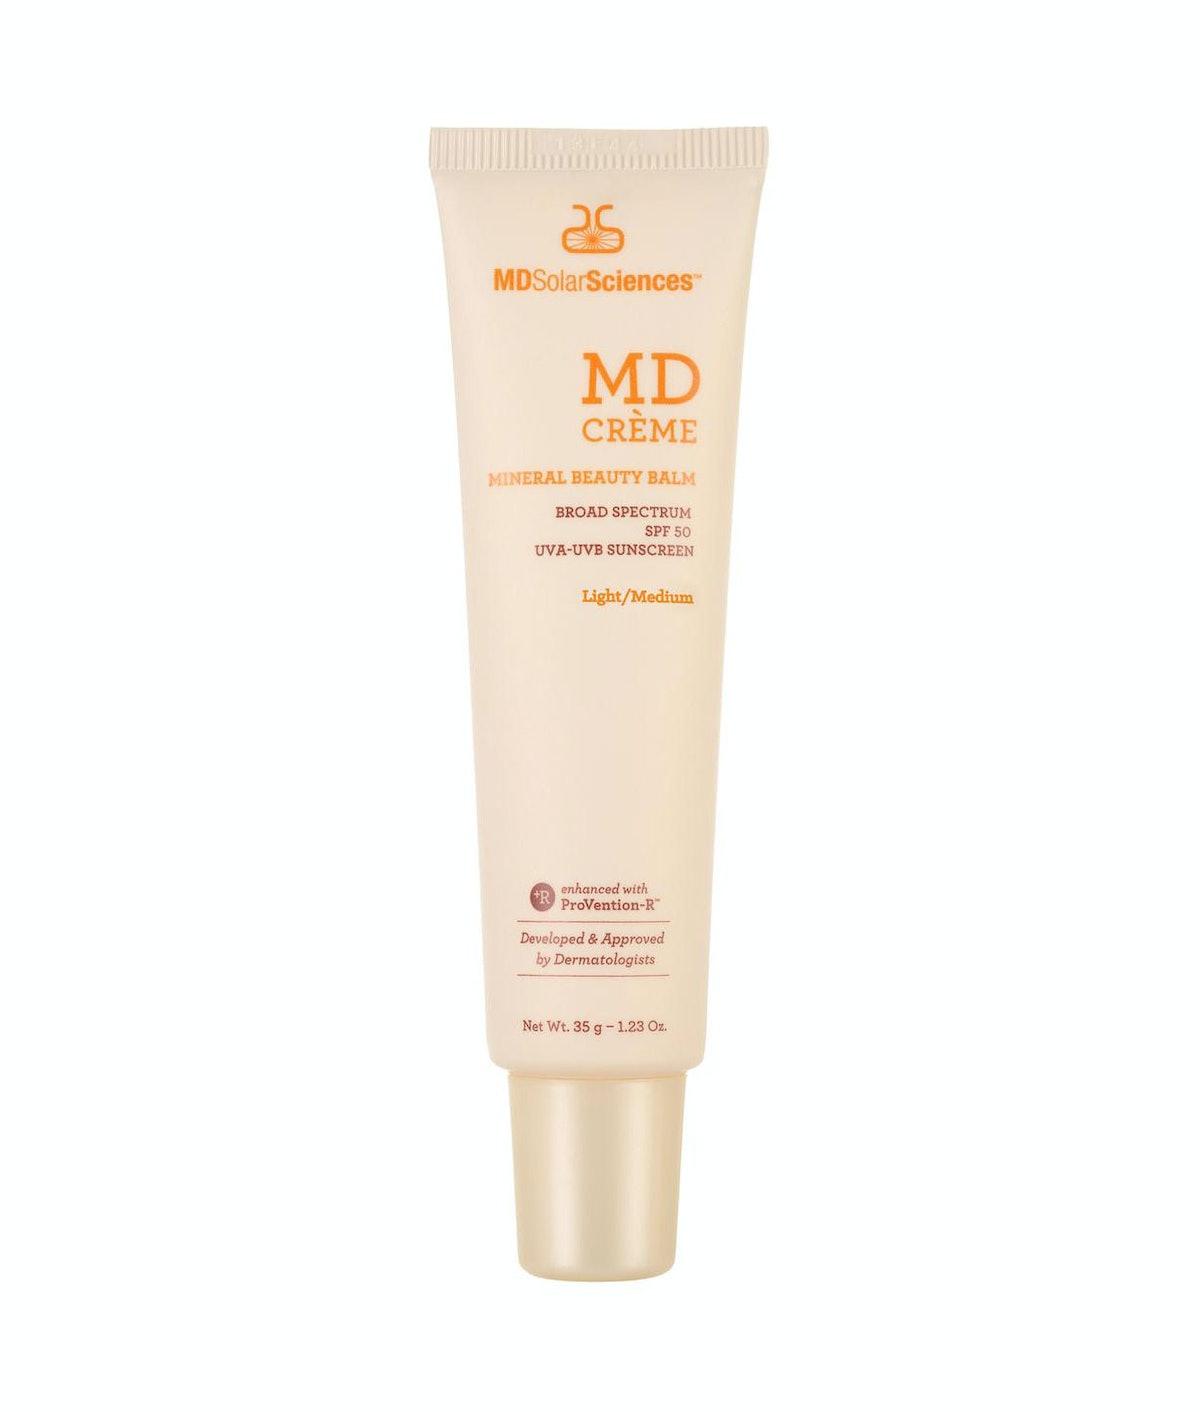 MDSolarSciences Beauty Balm